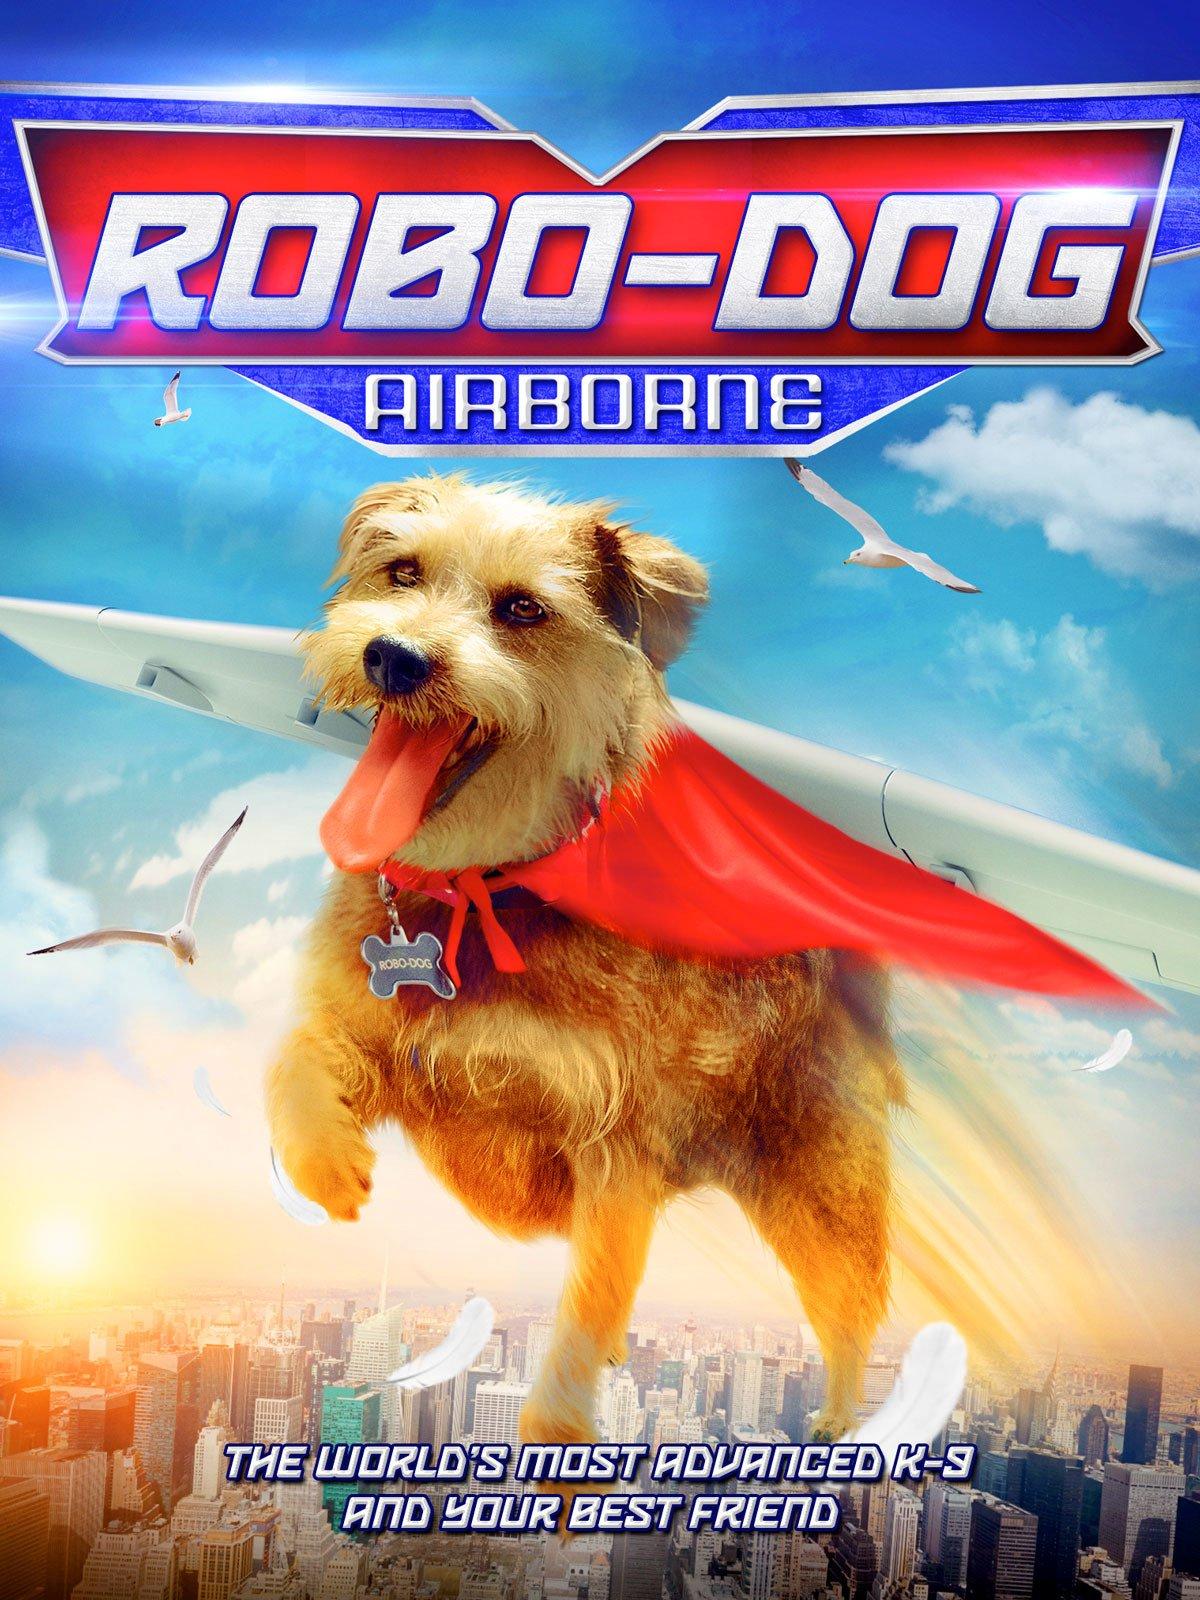 Robo-Dog: Airbourne